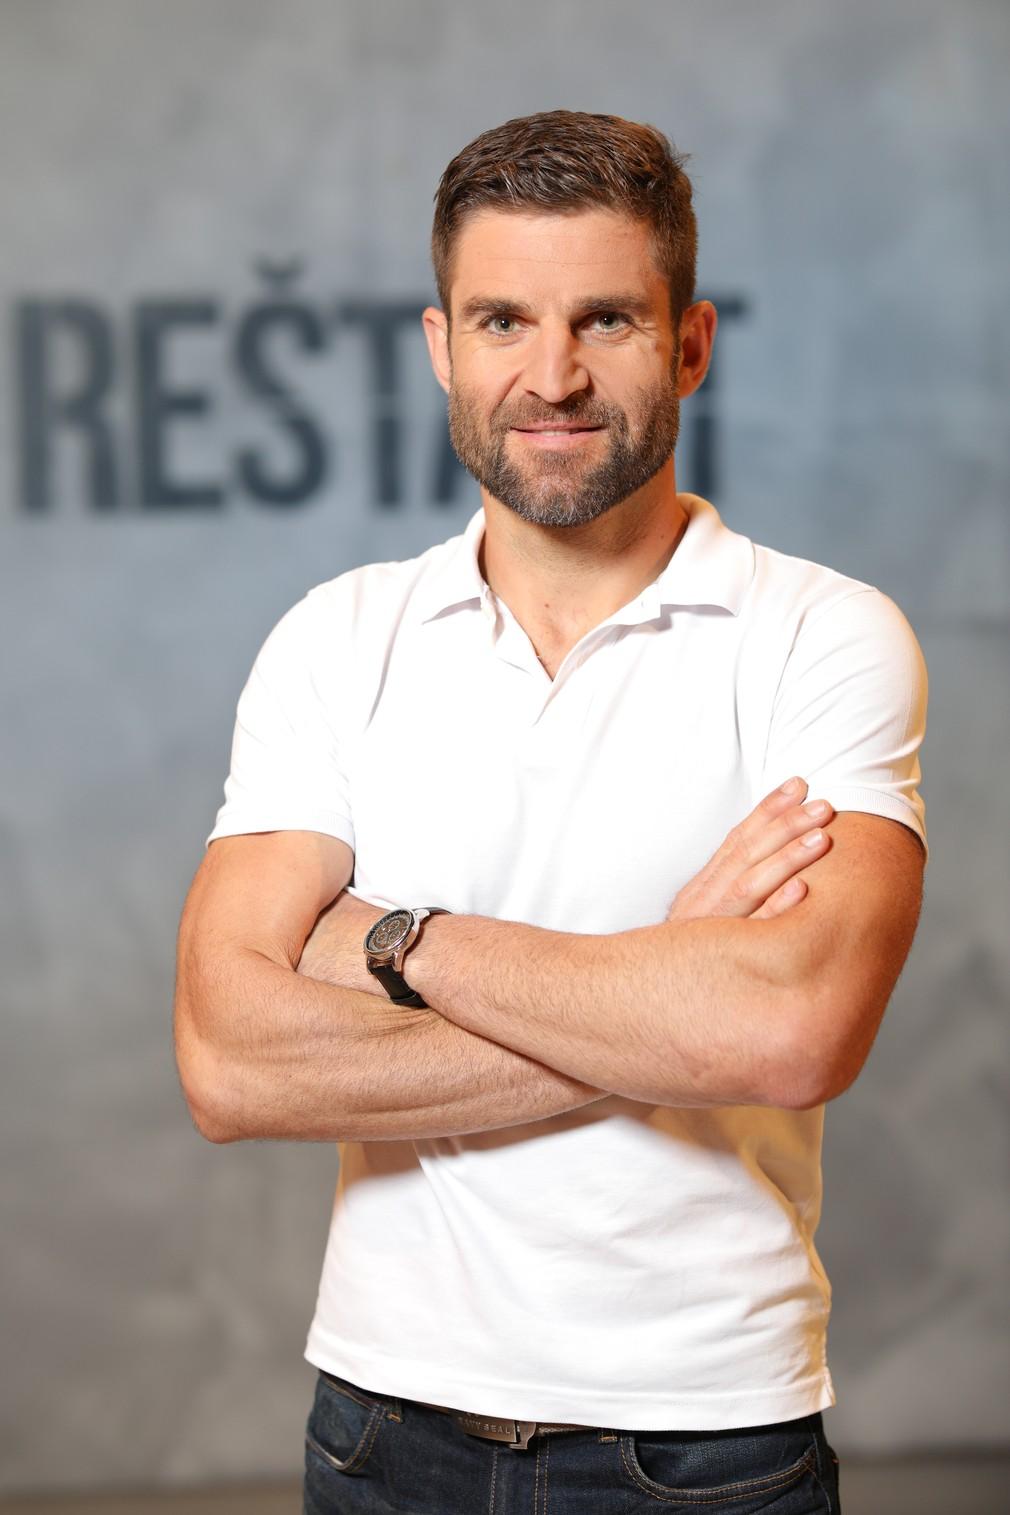 Viktor Bielik